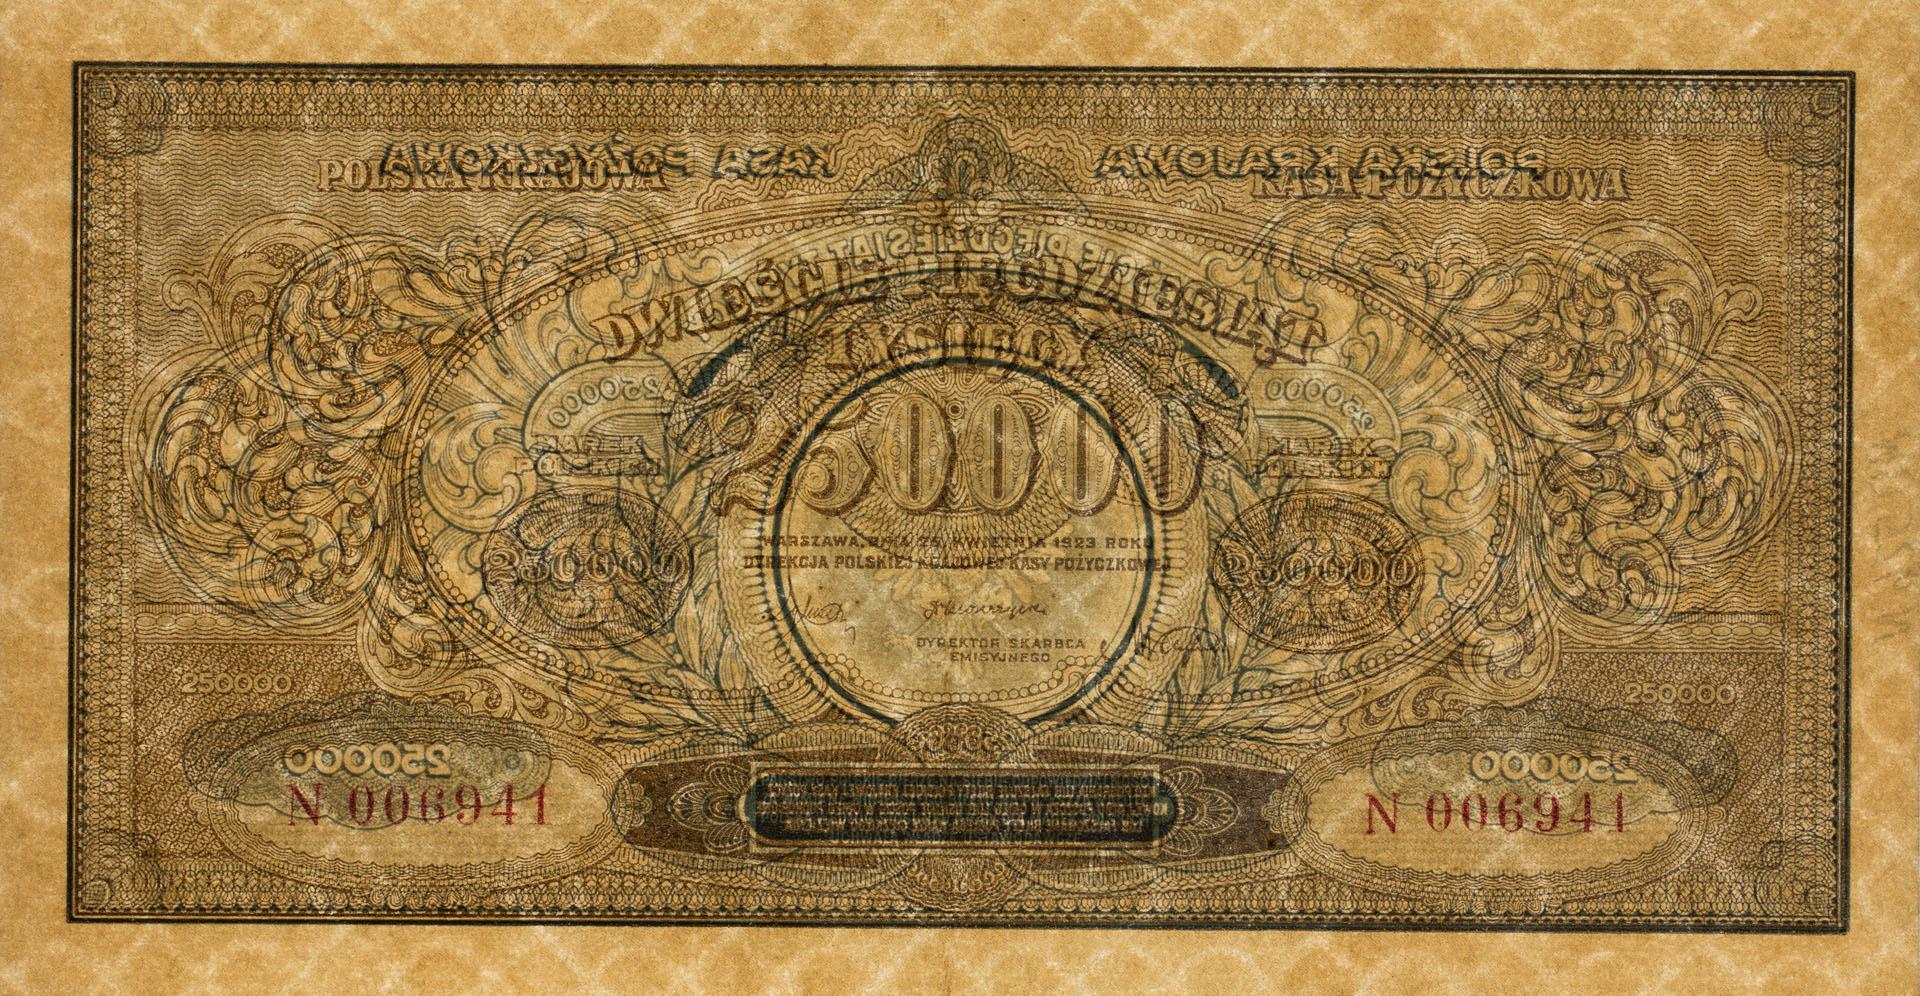 Banknot 250000 marek polskich